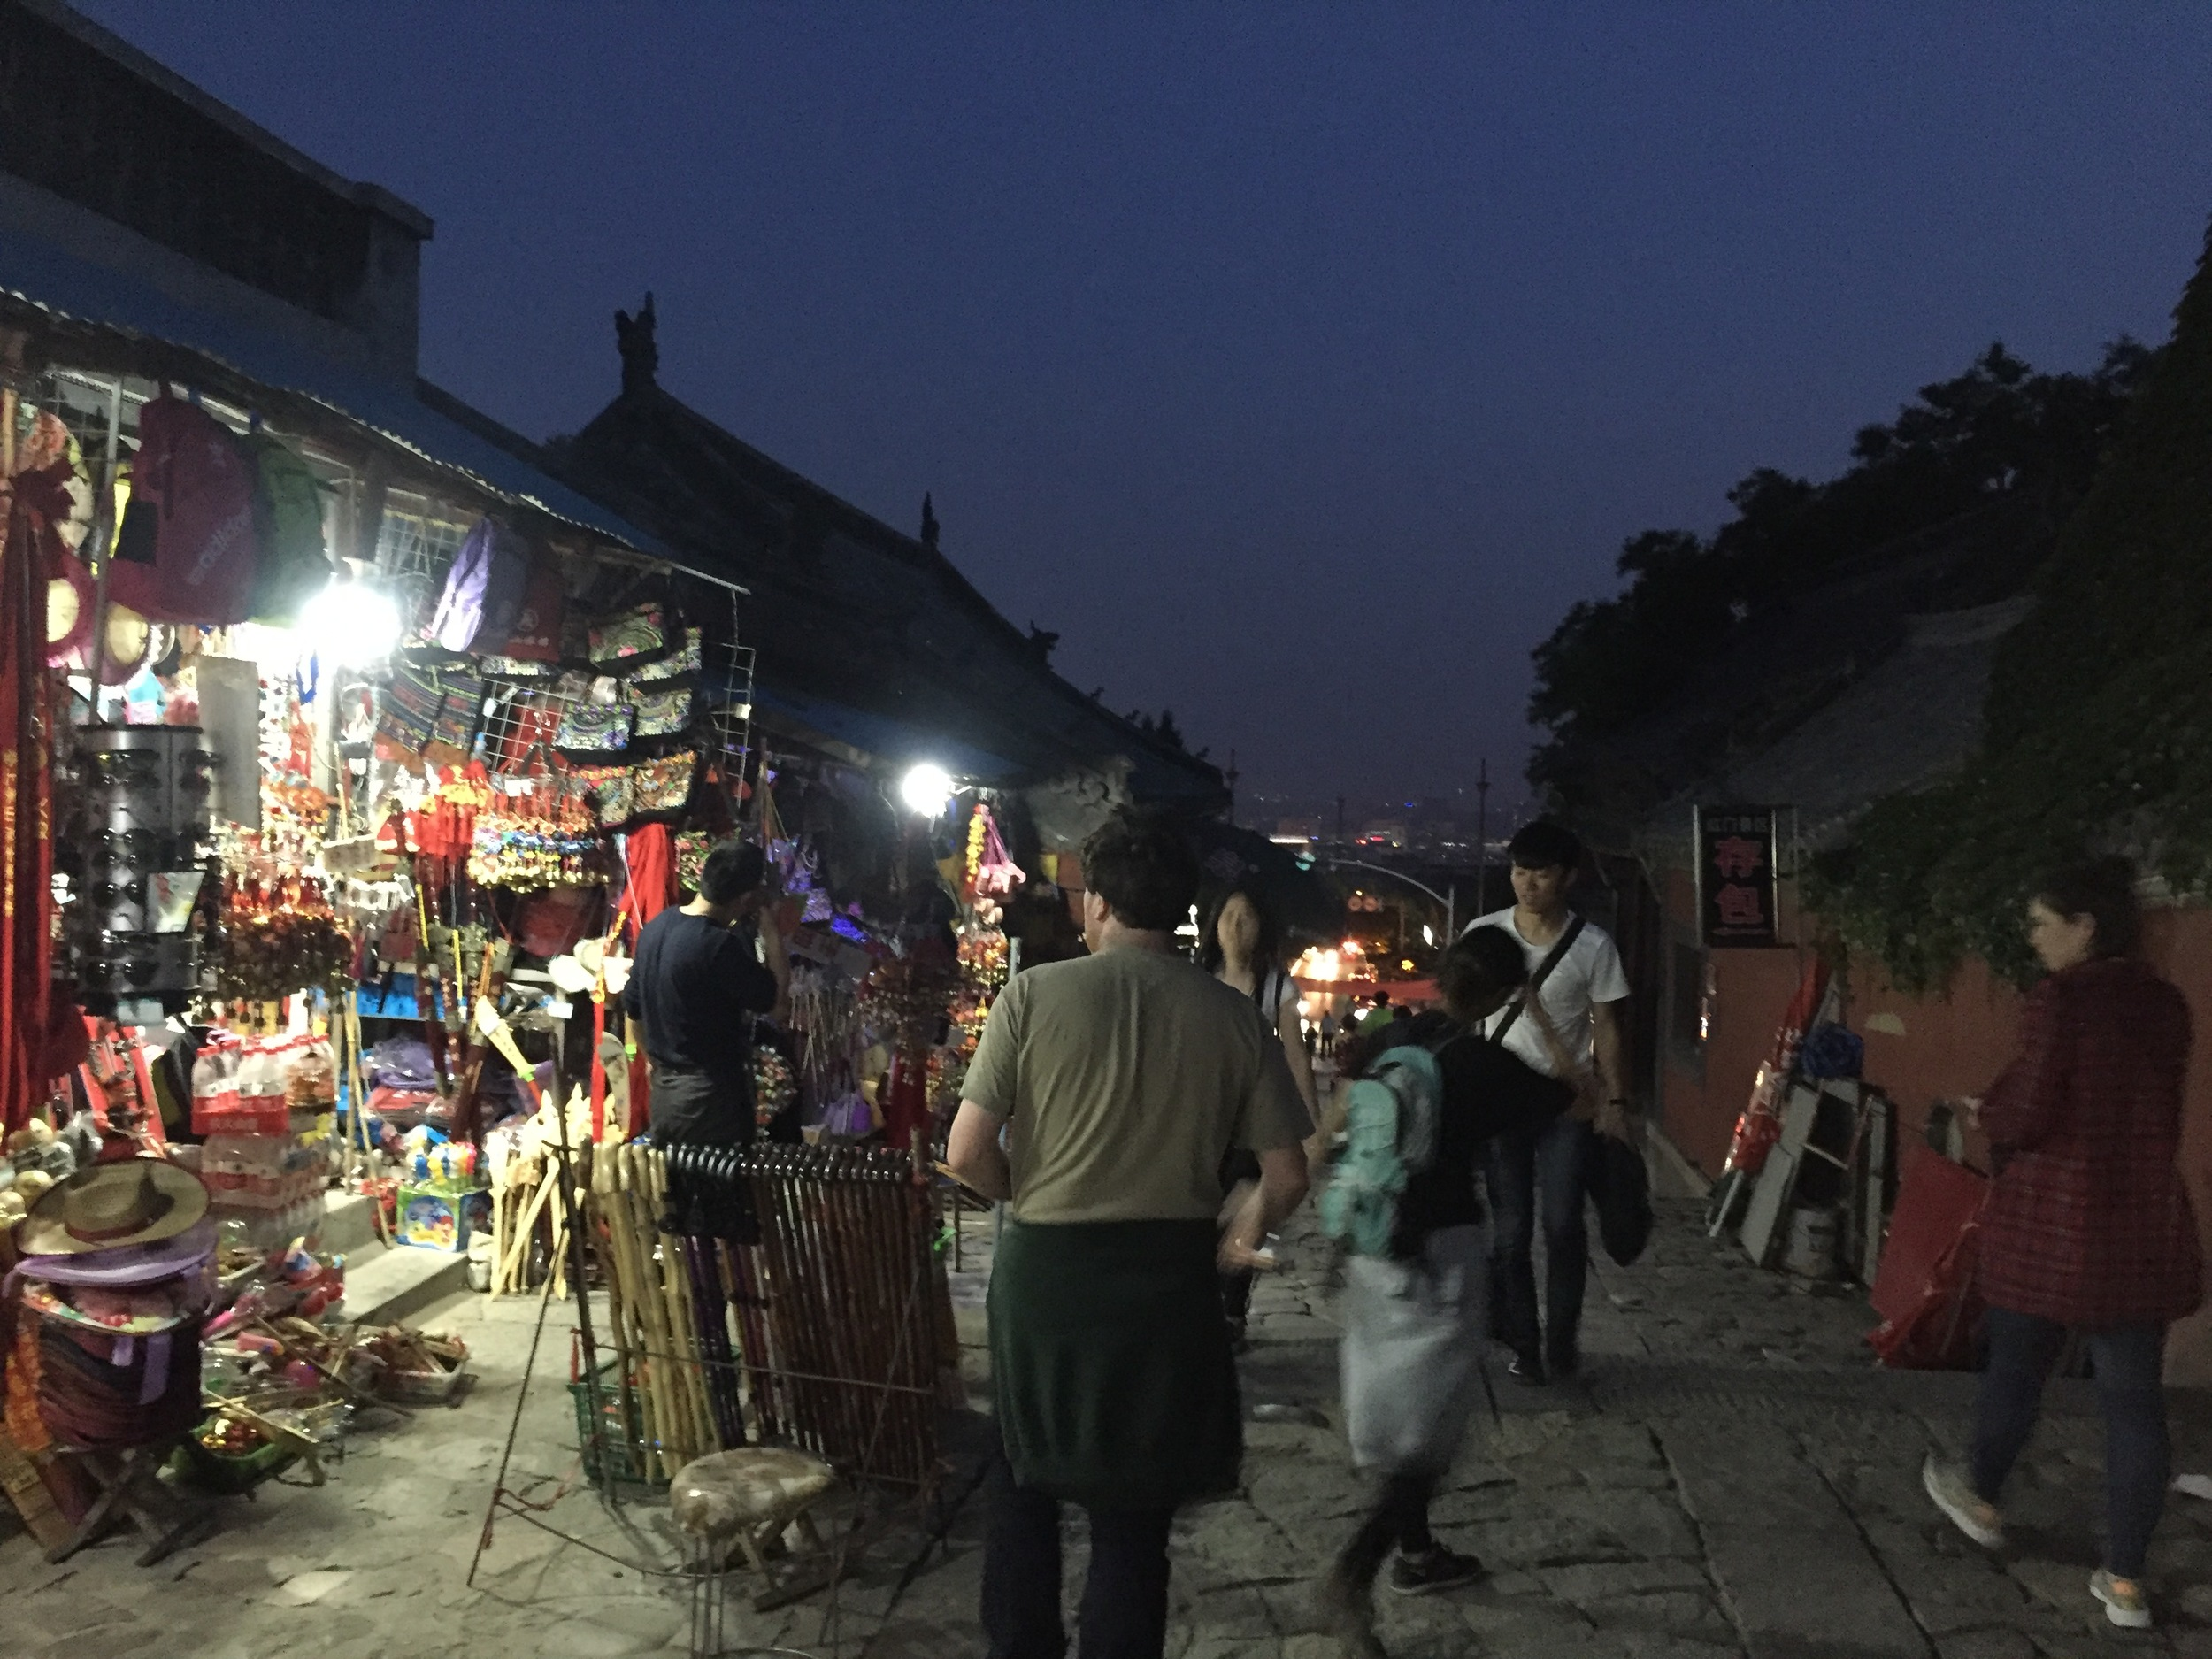 Vendors in the dark.